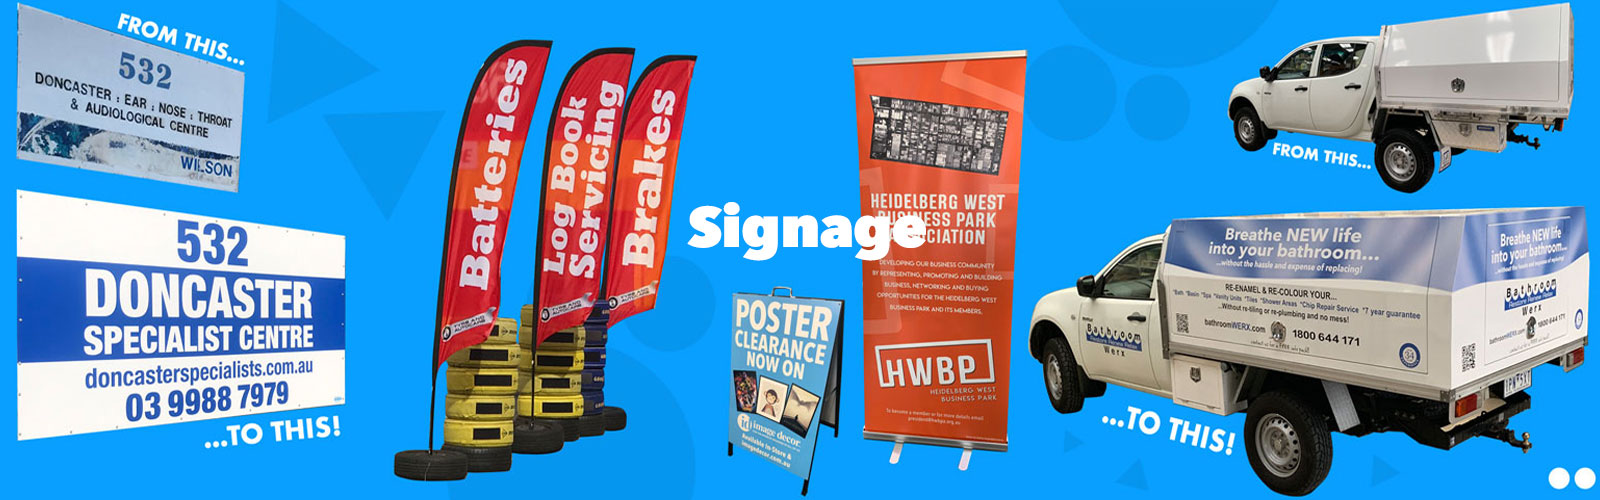 Signage @ Image Digital